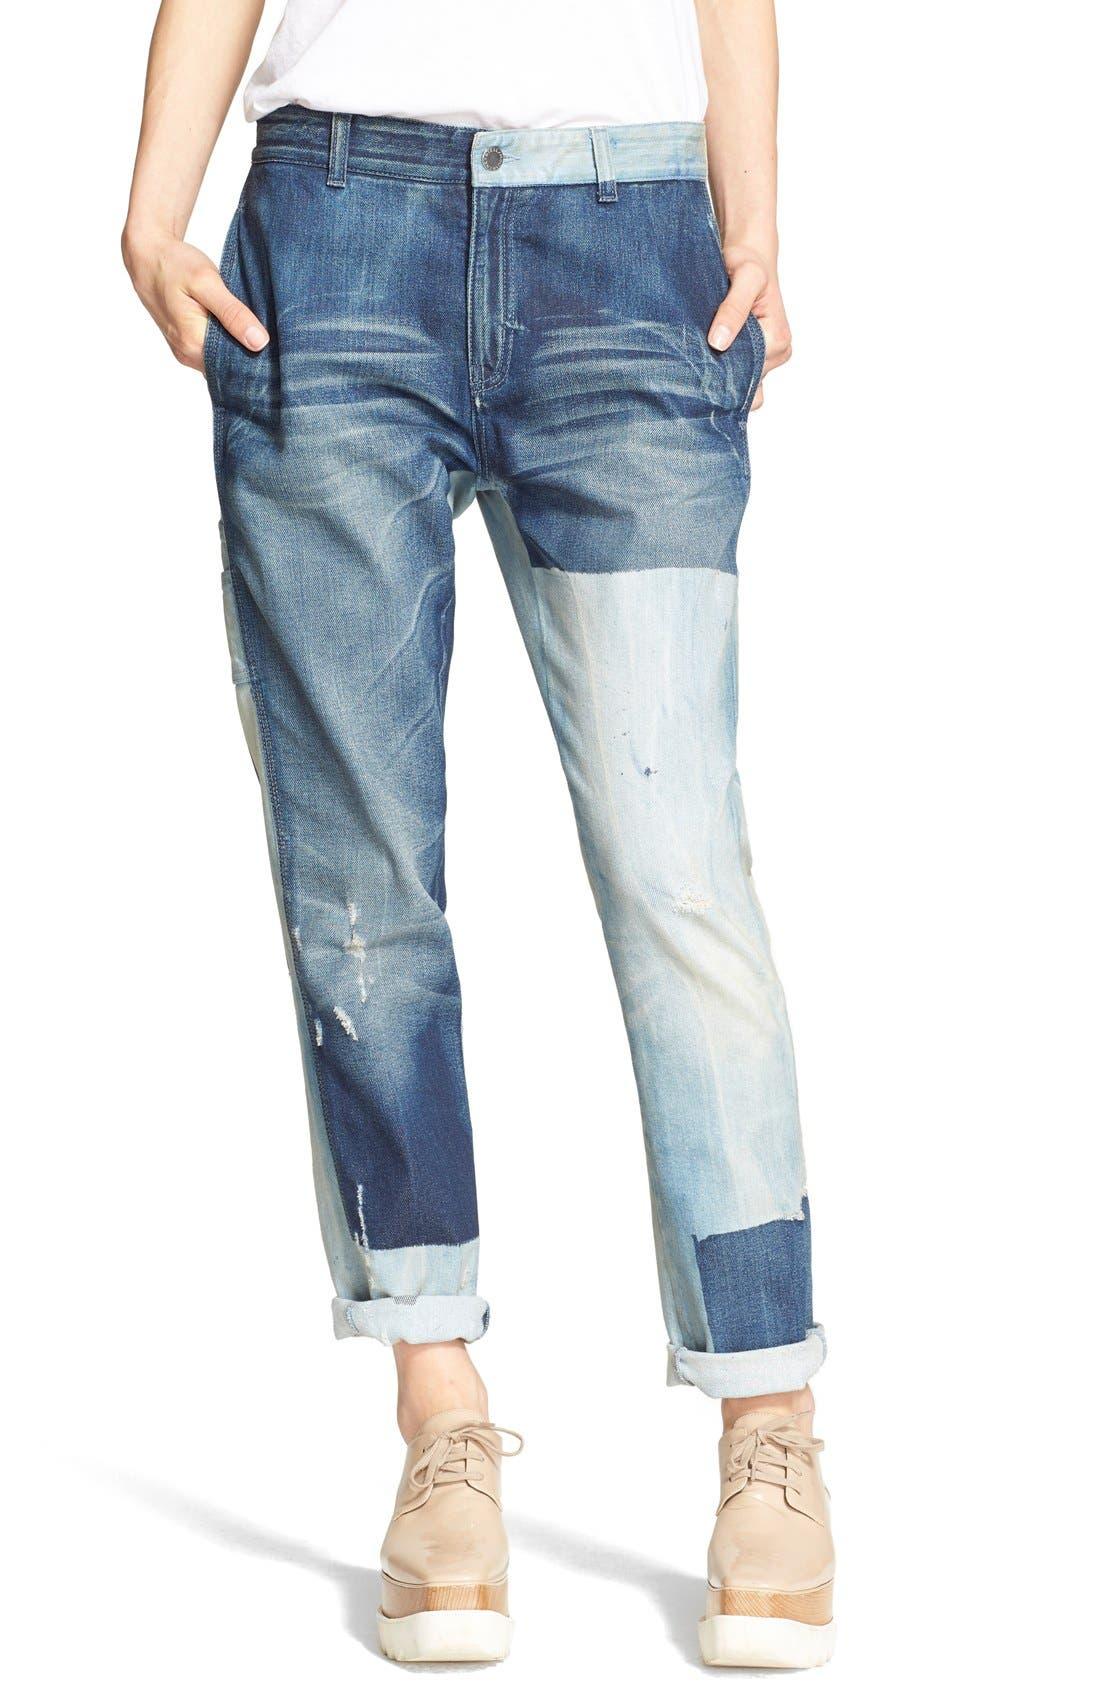 Alternate Image 1 Selected - Stella McCartney 'The Patchwork' Boyfriend Jeans